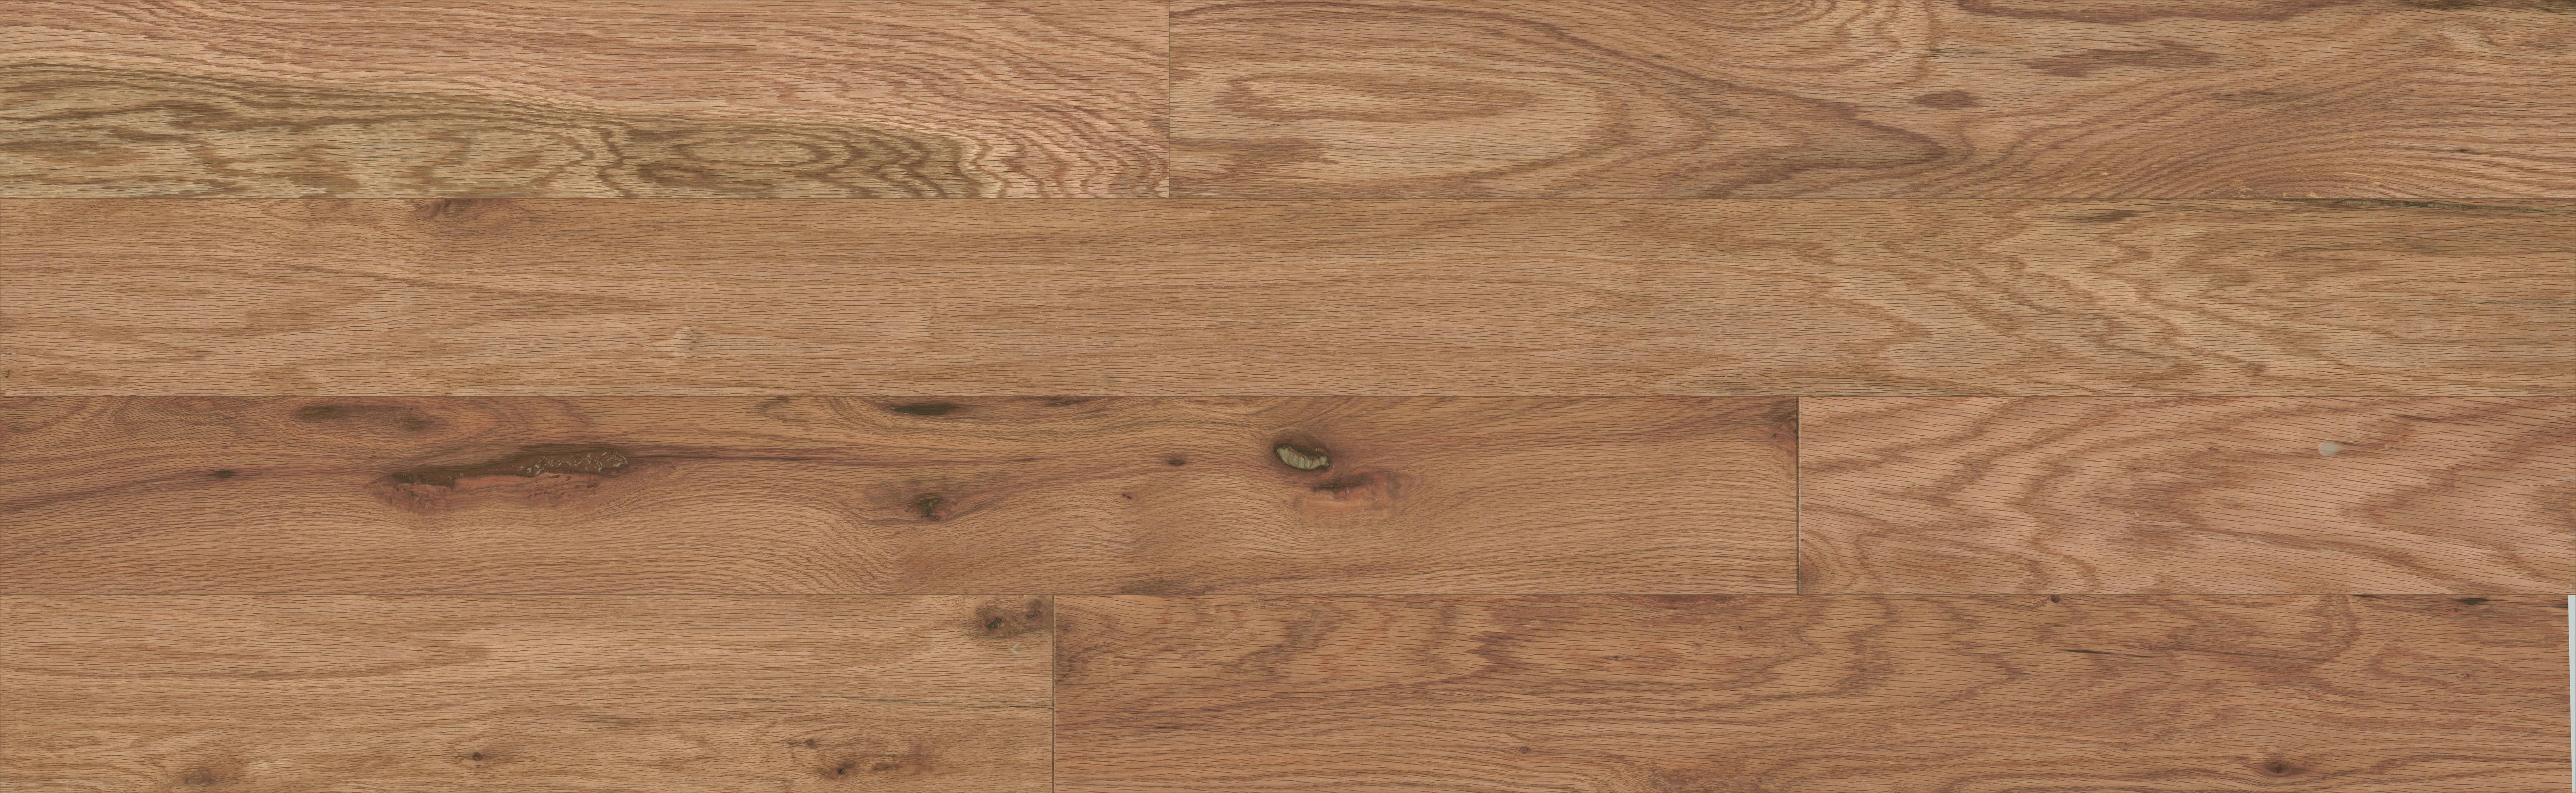 5 inch red oak hardwood flooring of mullican ridgecrest red oak natural 1 2 thick 5 wide engineered for mullican ridgecrest red oak natural 1 2 thick 5 wide engineered hardwood flooring